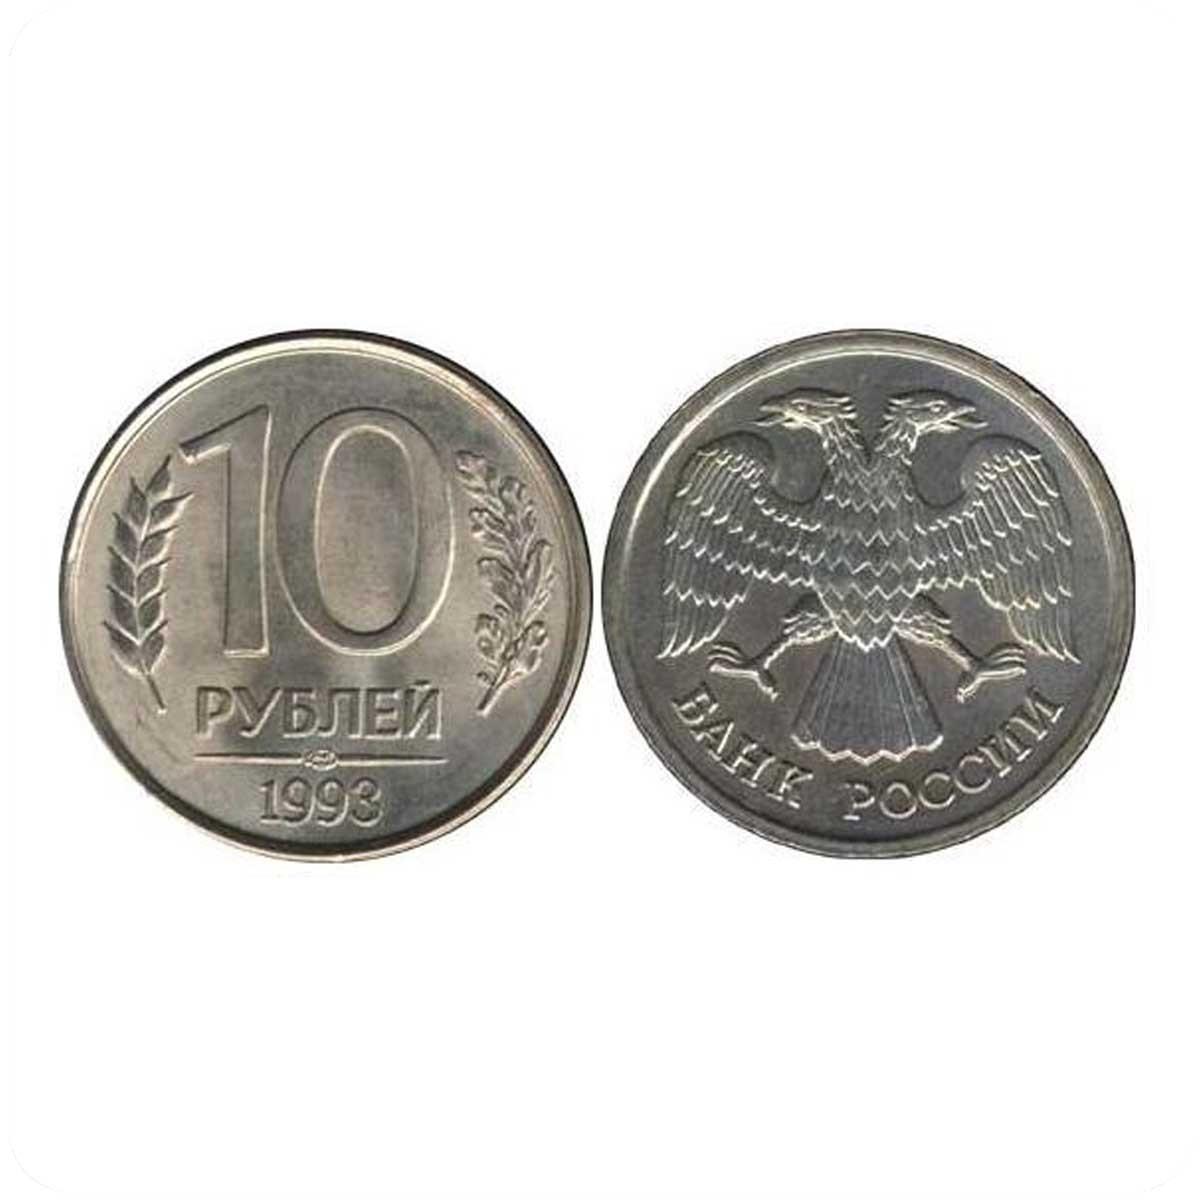 10 рублей 1993 ЛМД магнитная код 21779